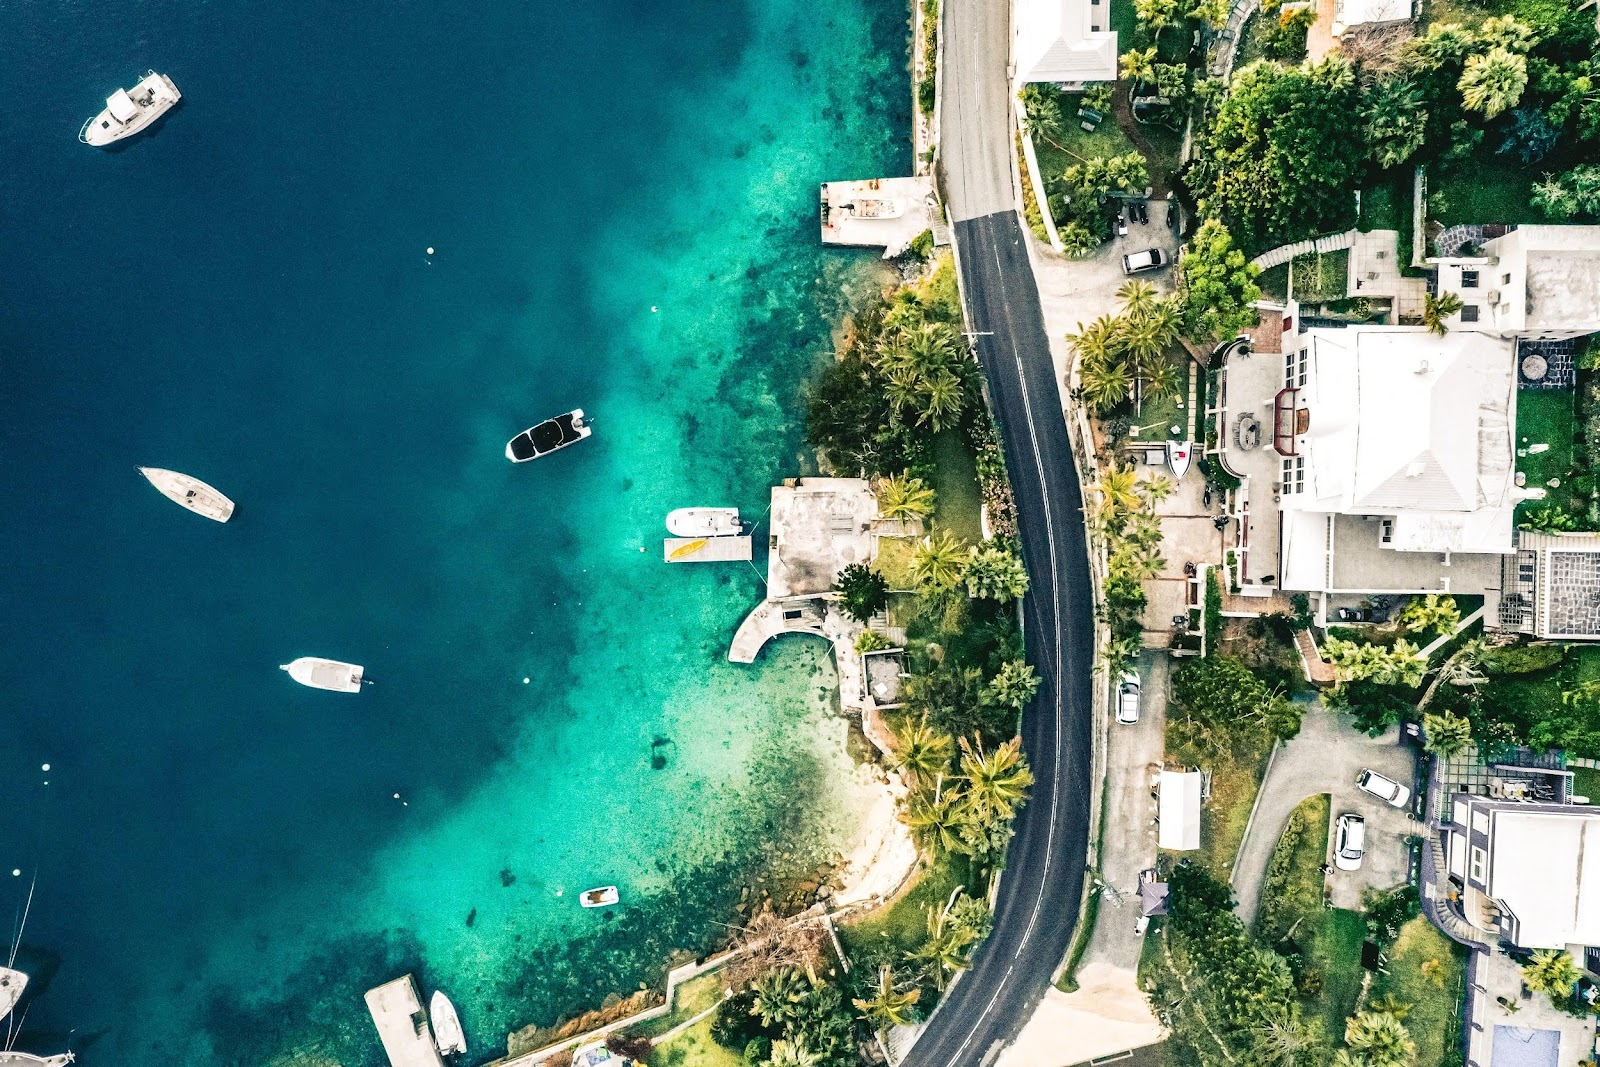 Information about Bermuda's digital nomad visa for remote workers, freelancers and internet entrepreneurs